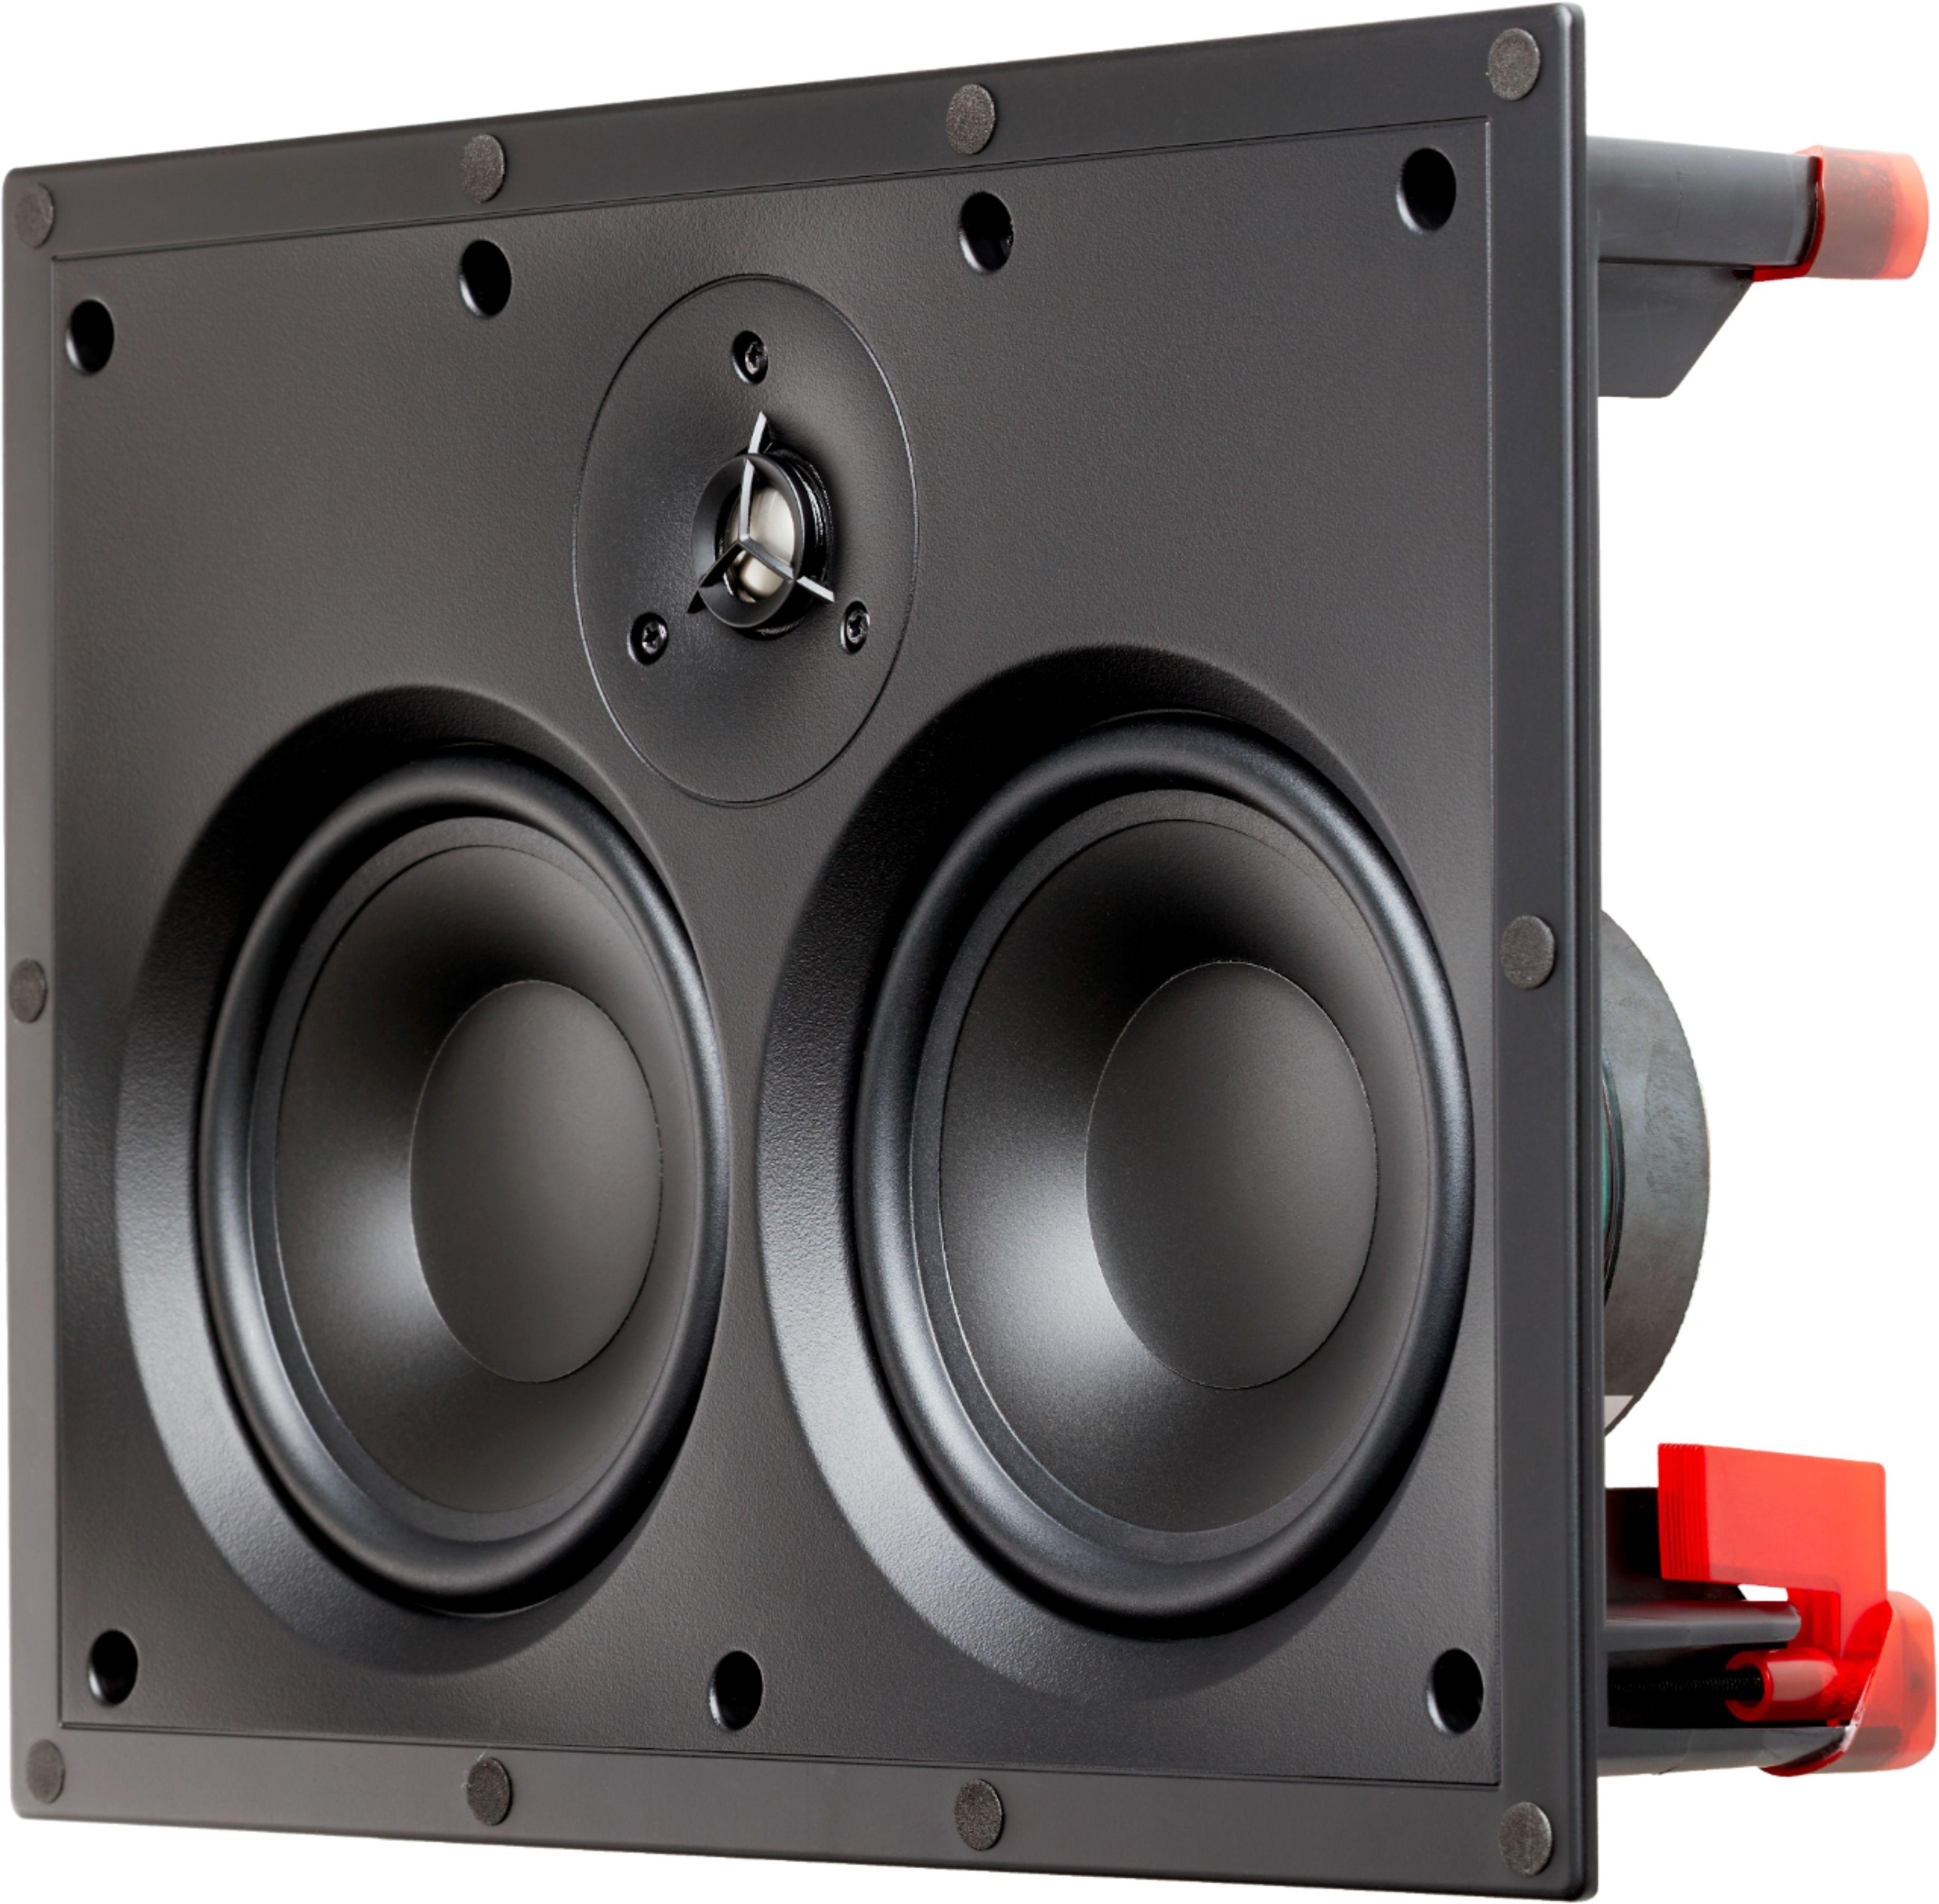 "Installer Dual 5-1/2"" 70-Watt Passive 2-Way In-Wall Speaker (Each)"